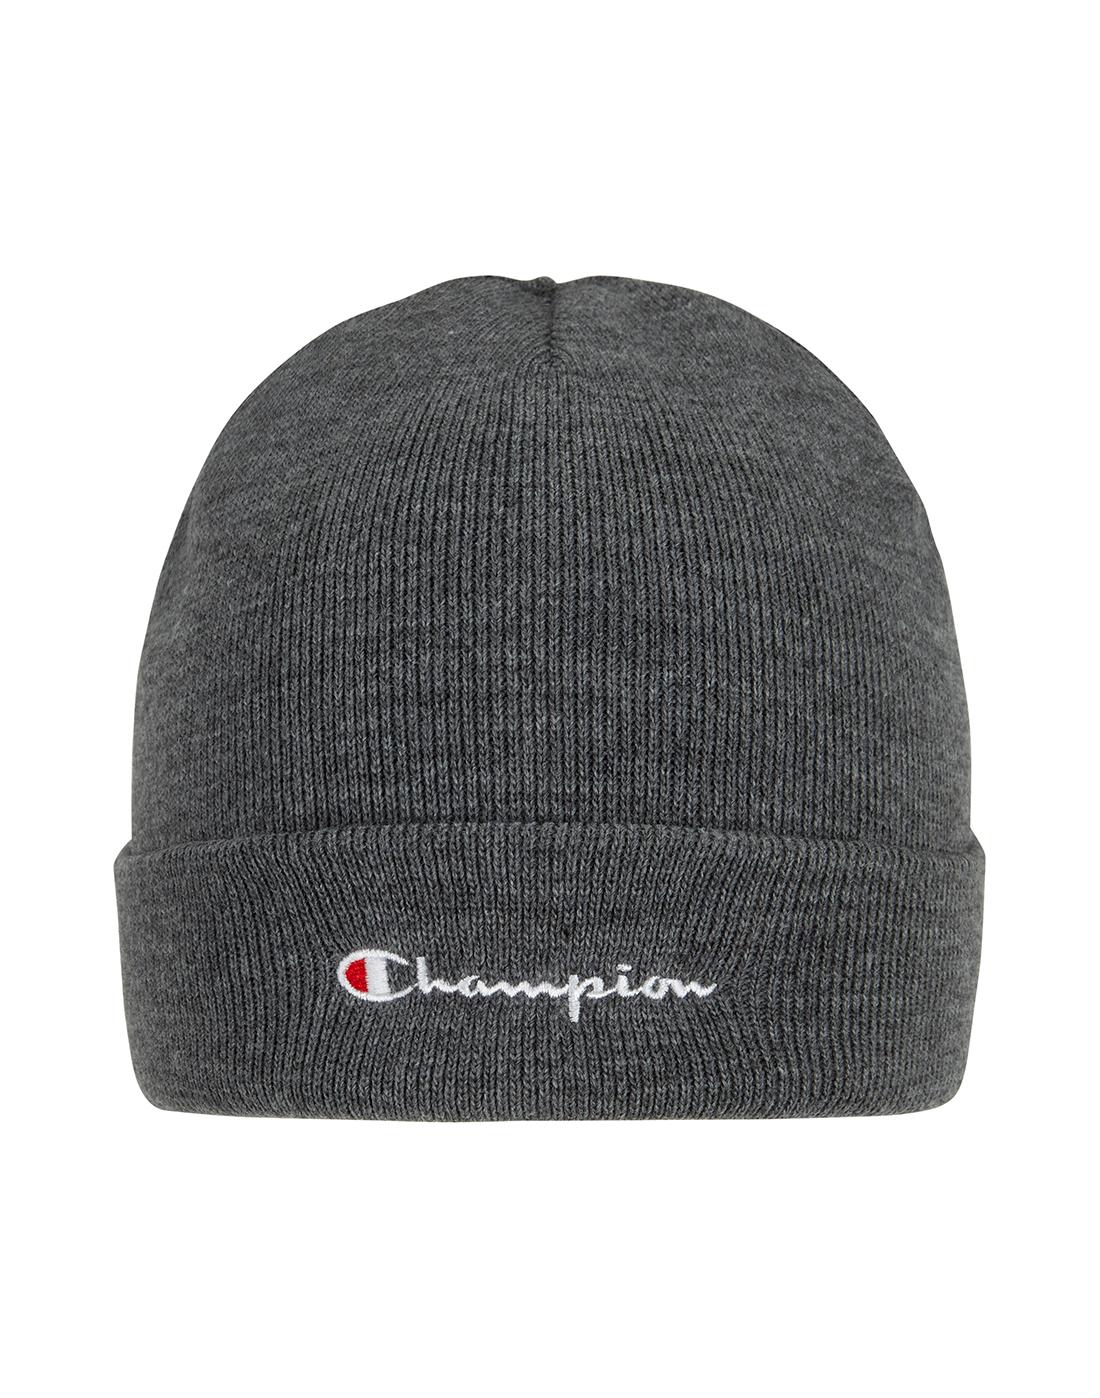 Champion Logo Knit Beanie  66b93a48e0e2